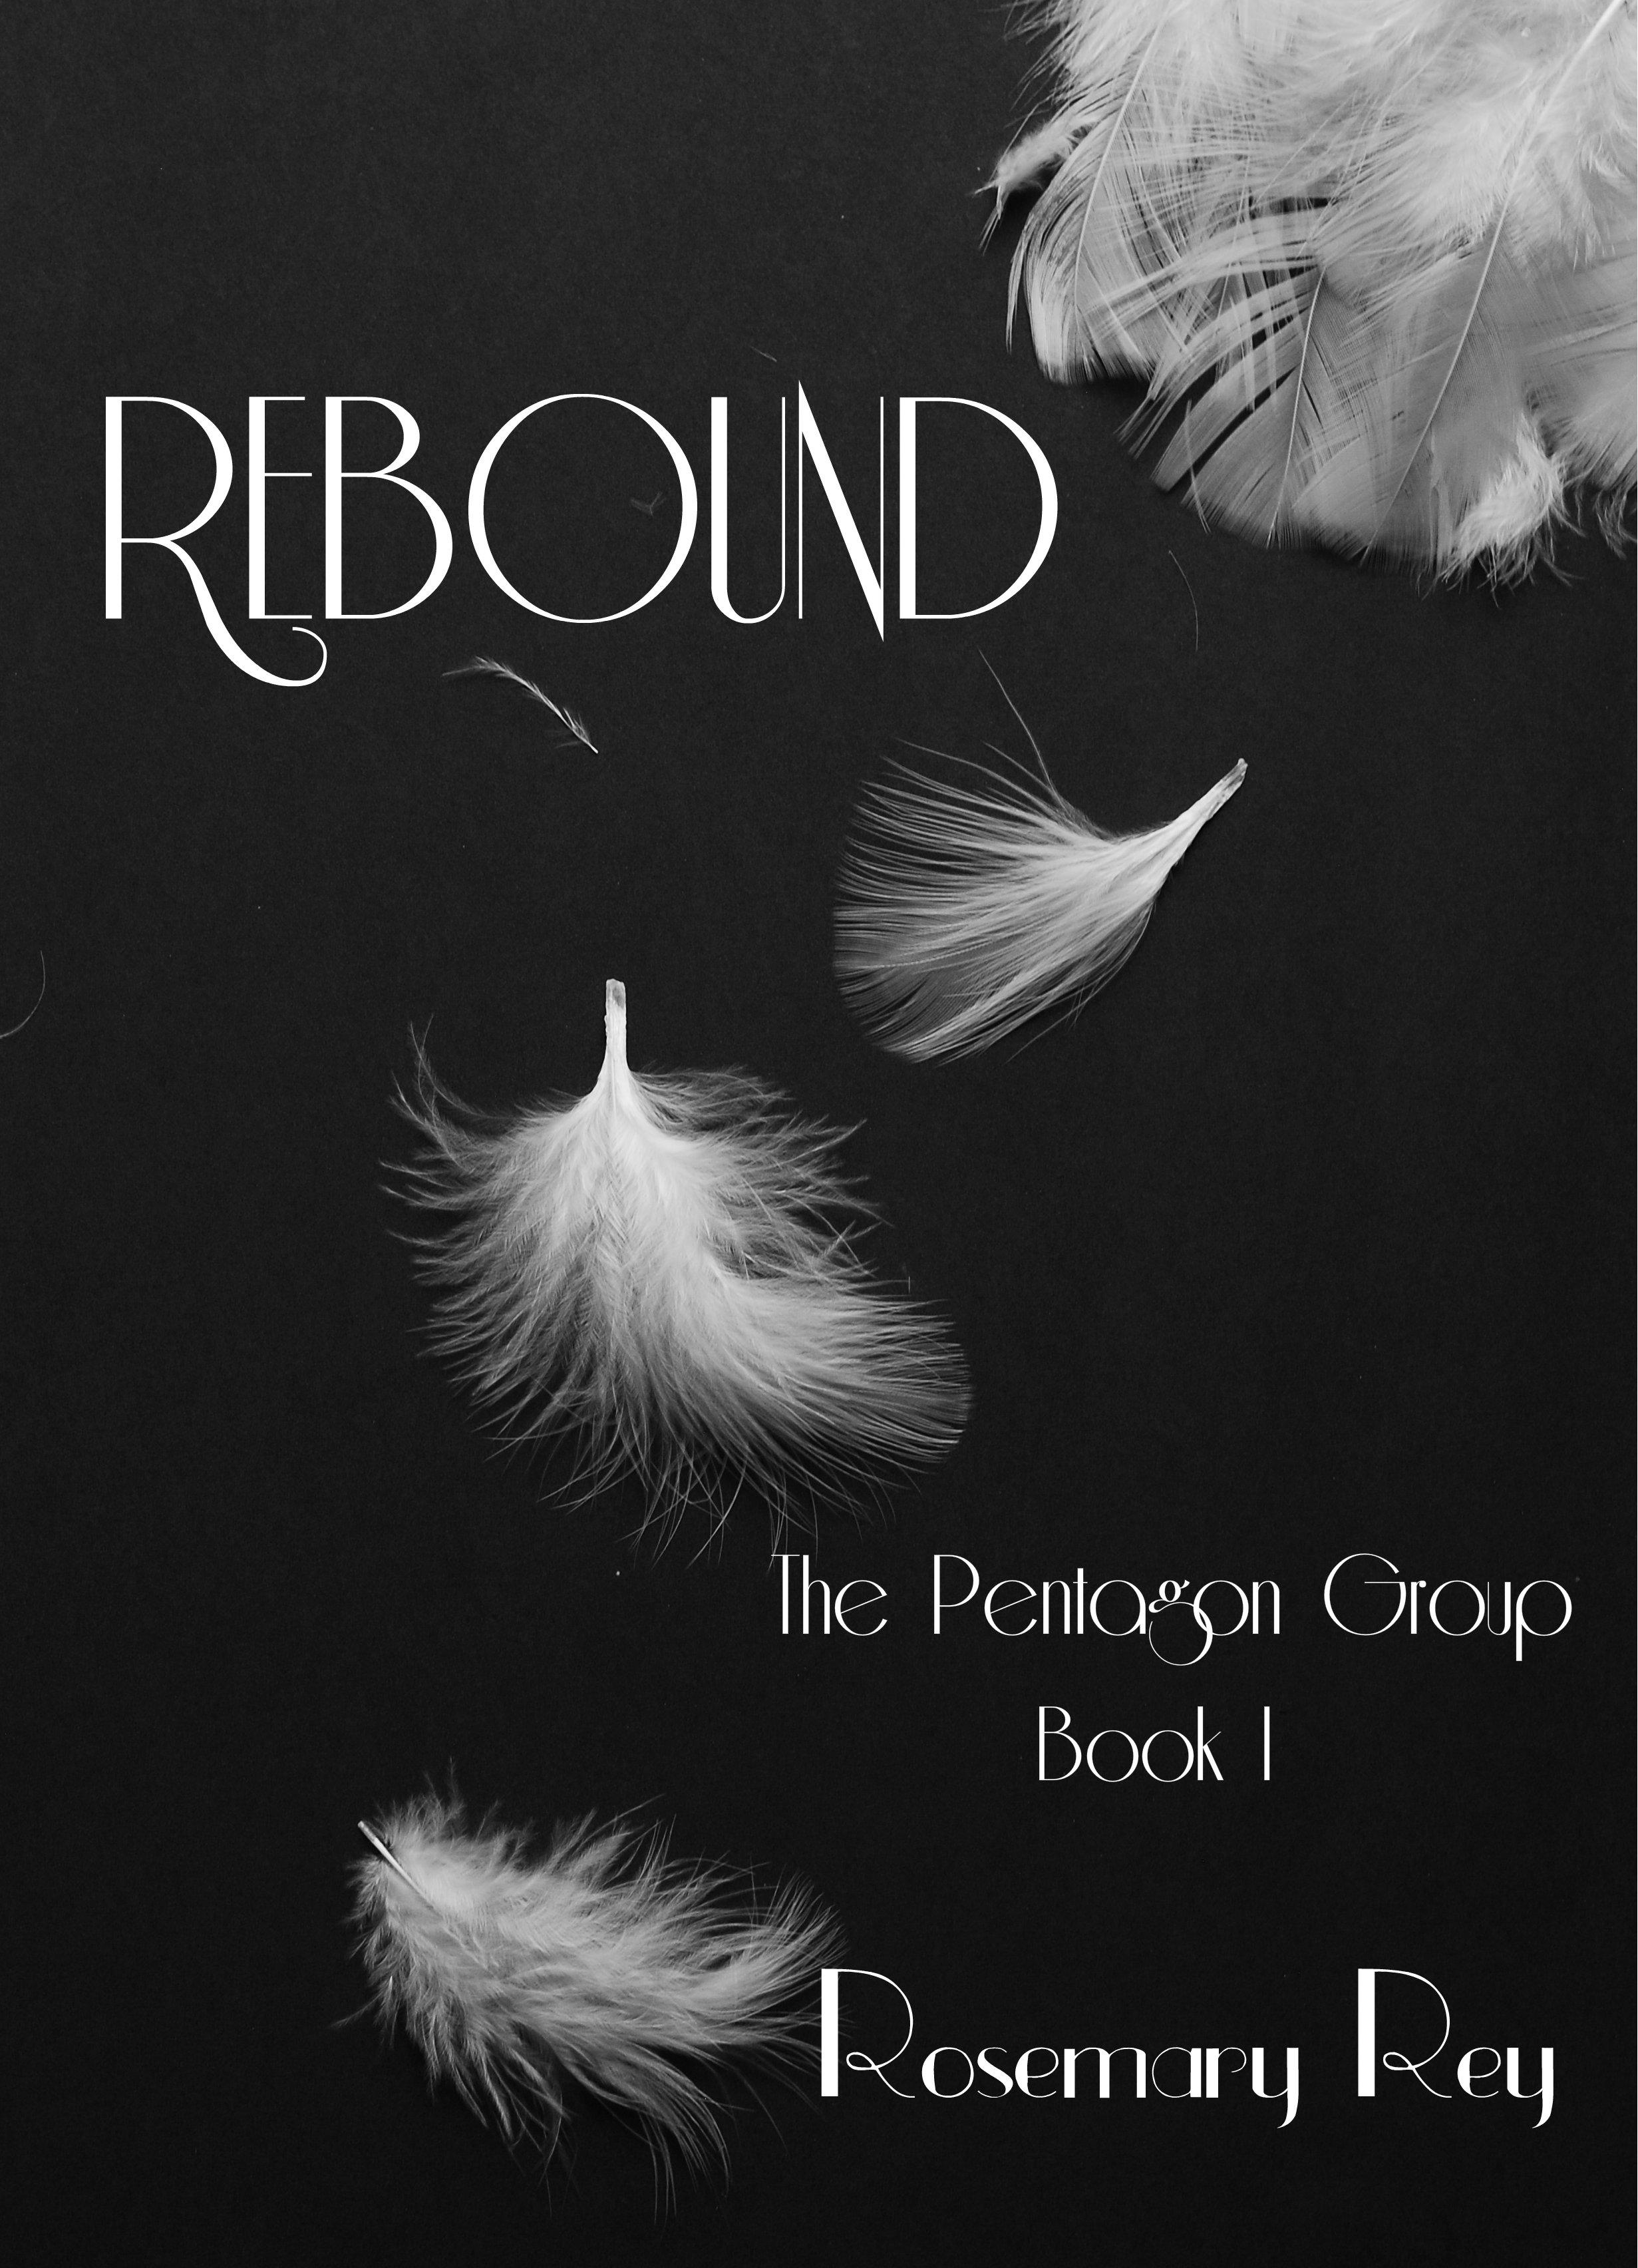 ReboundBookICover